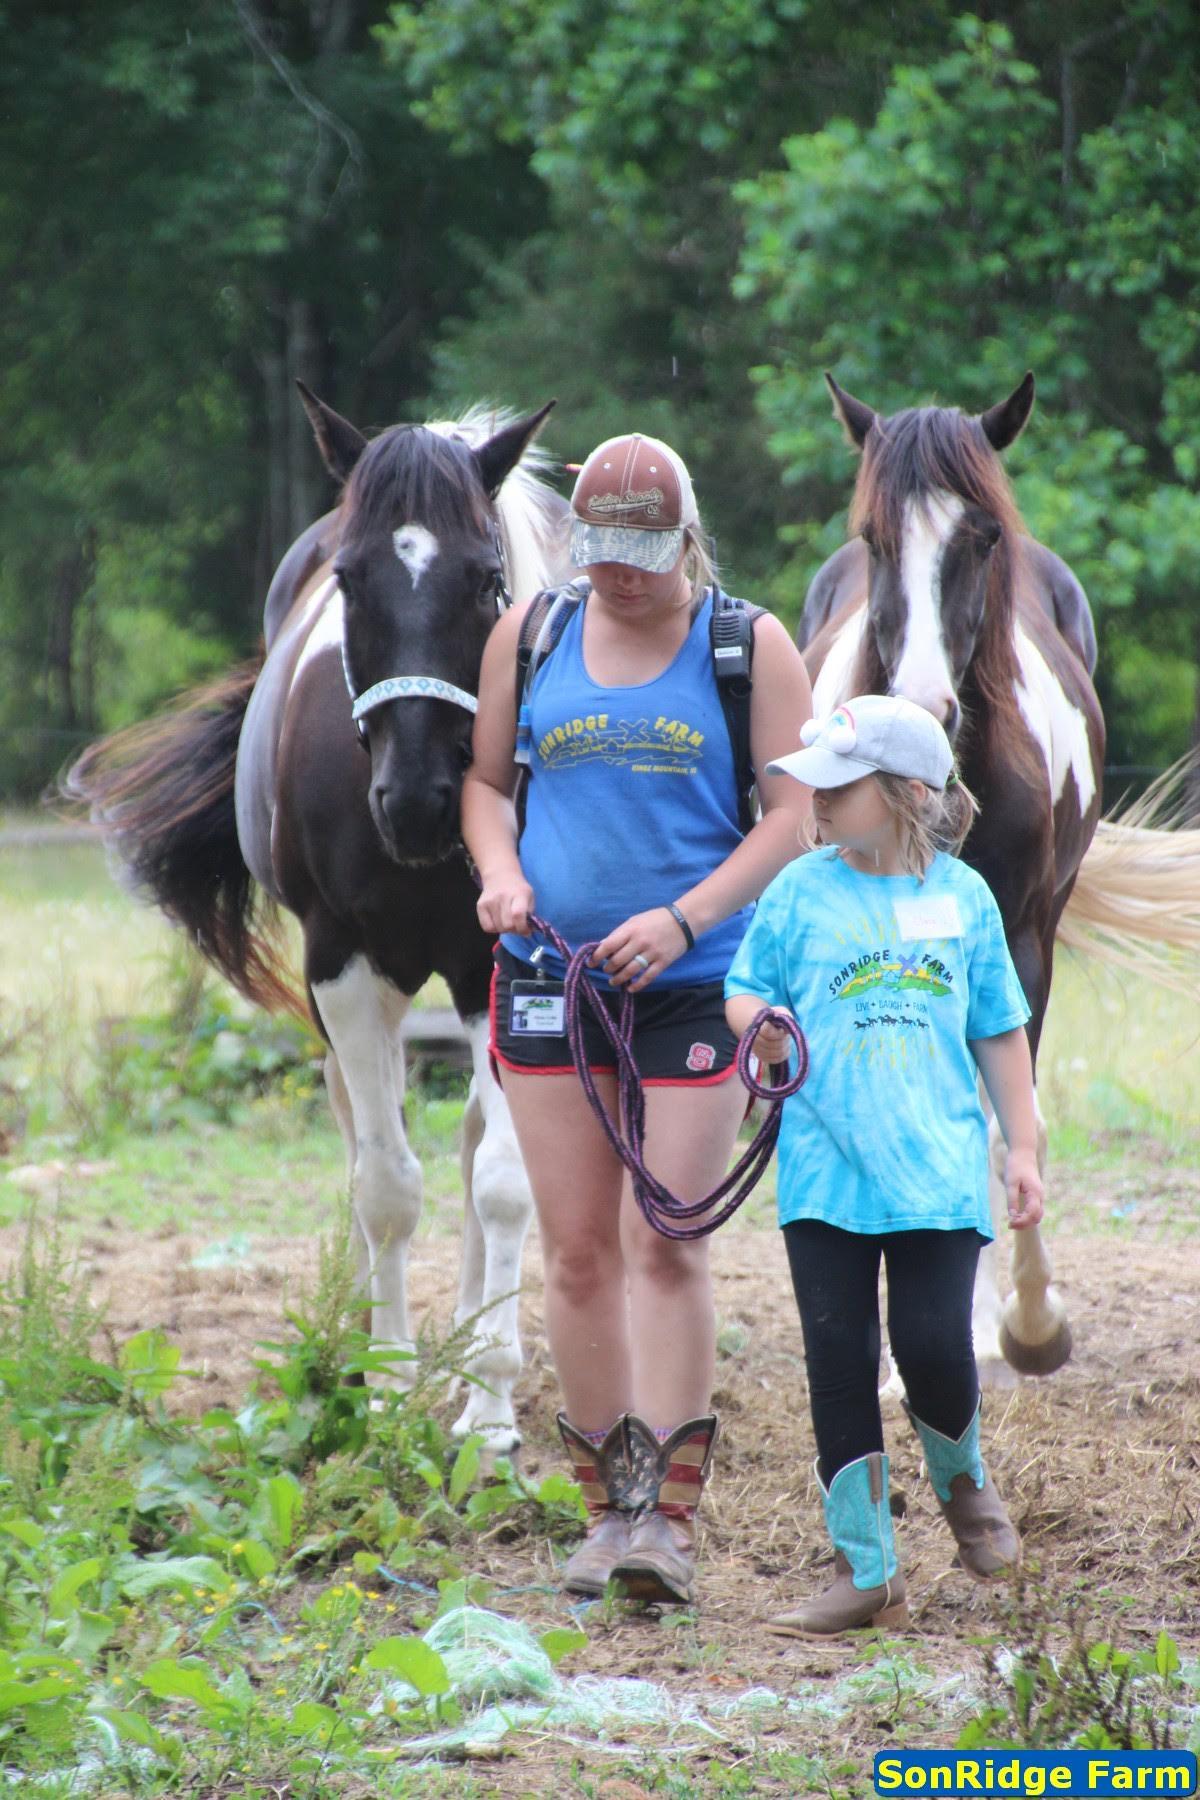 Camper leading horse